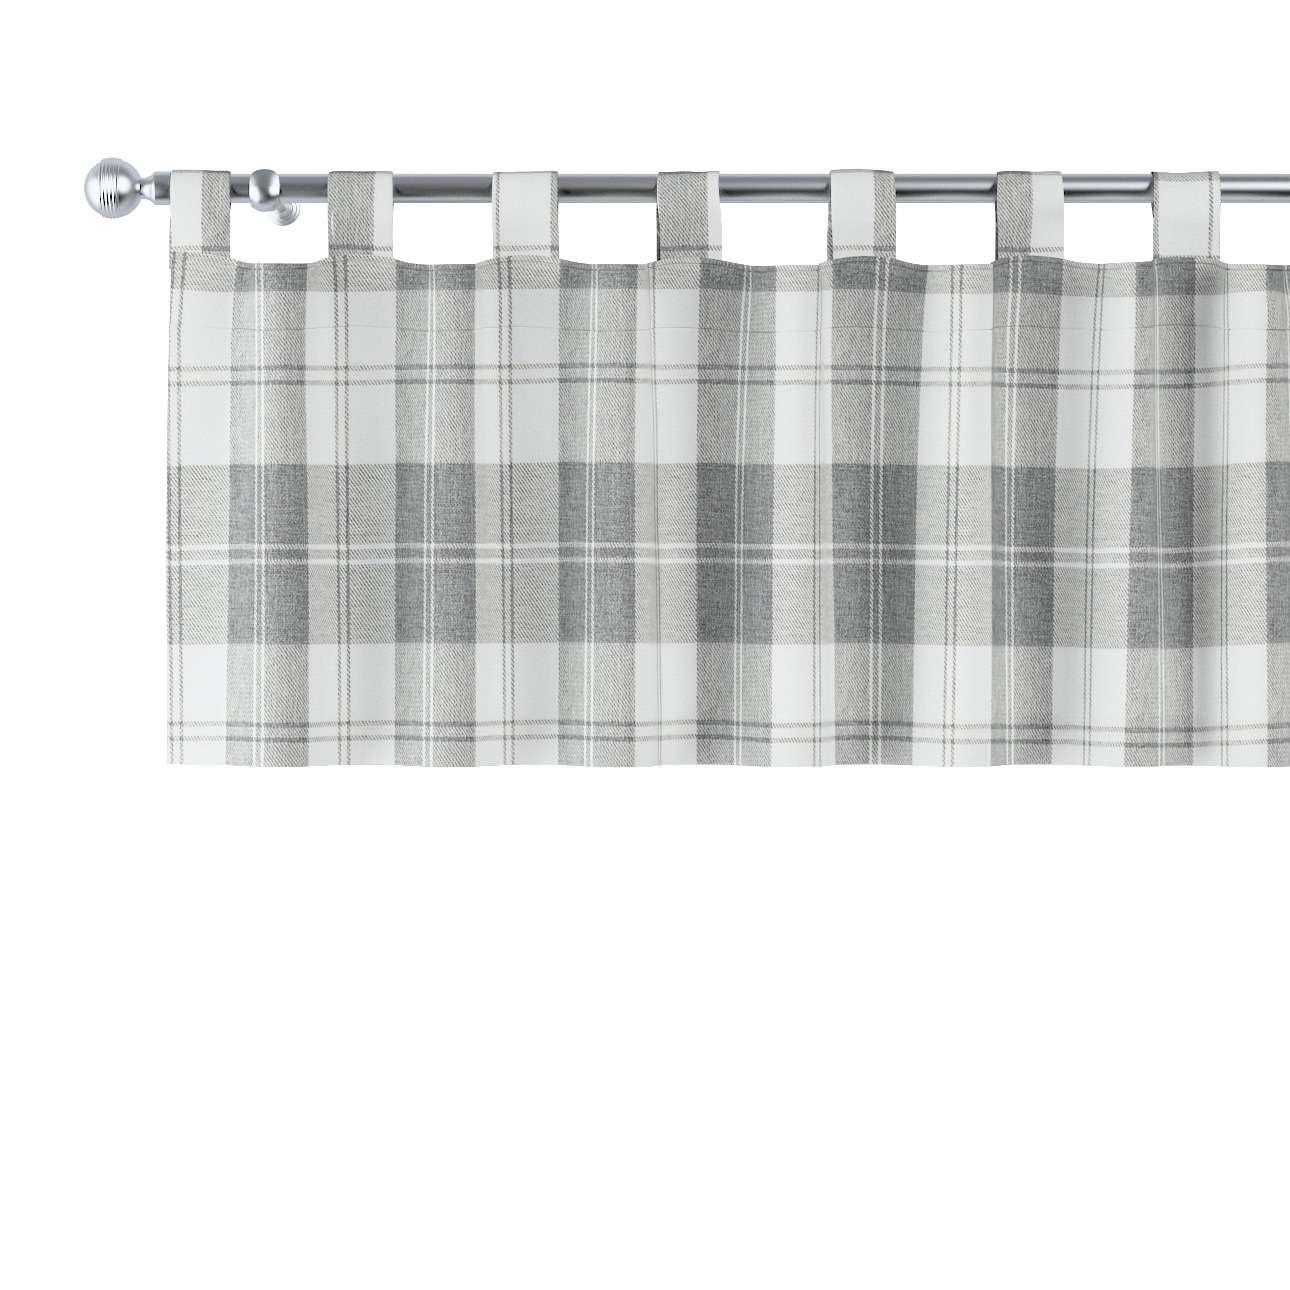 Lambrekin na szelkach 130x40cm w kolekcji Edinburgh, tkanina: 115-79